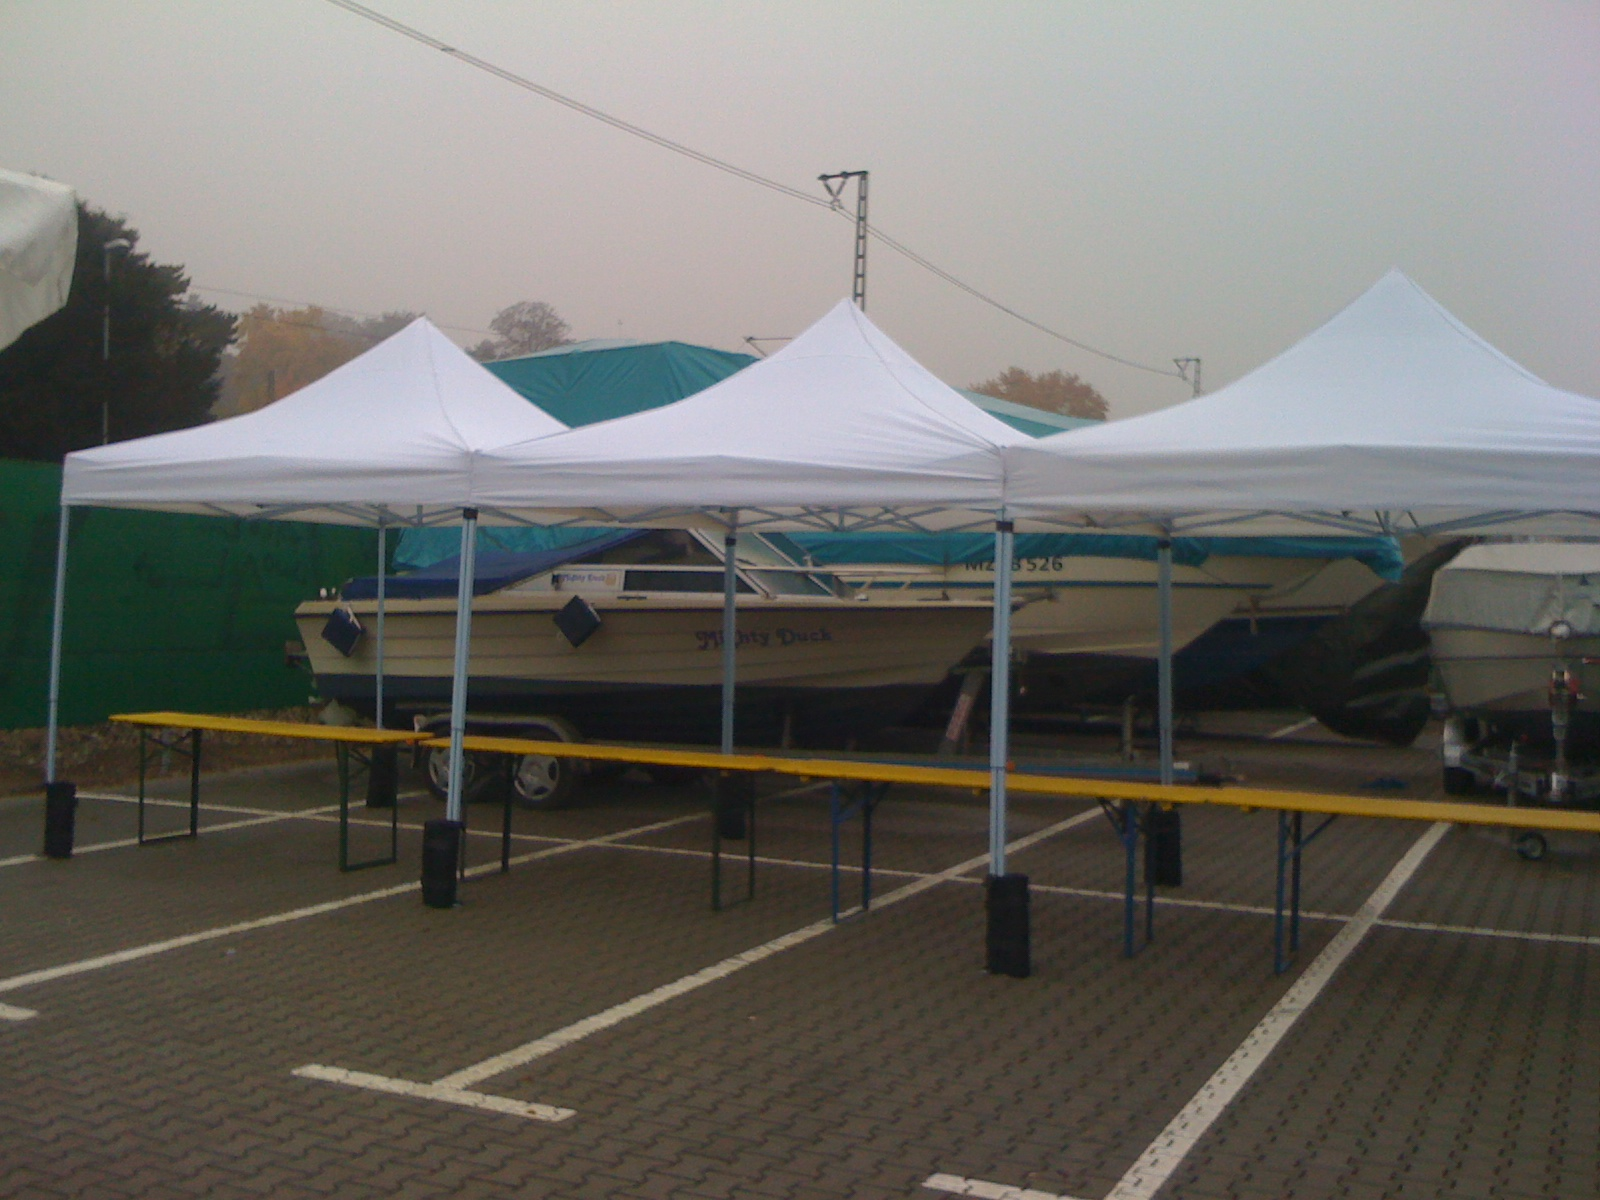 Gewichte Zelt Pavillon : Zelte und pavillons eventagent